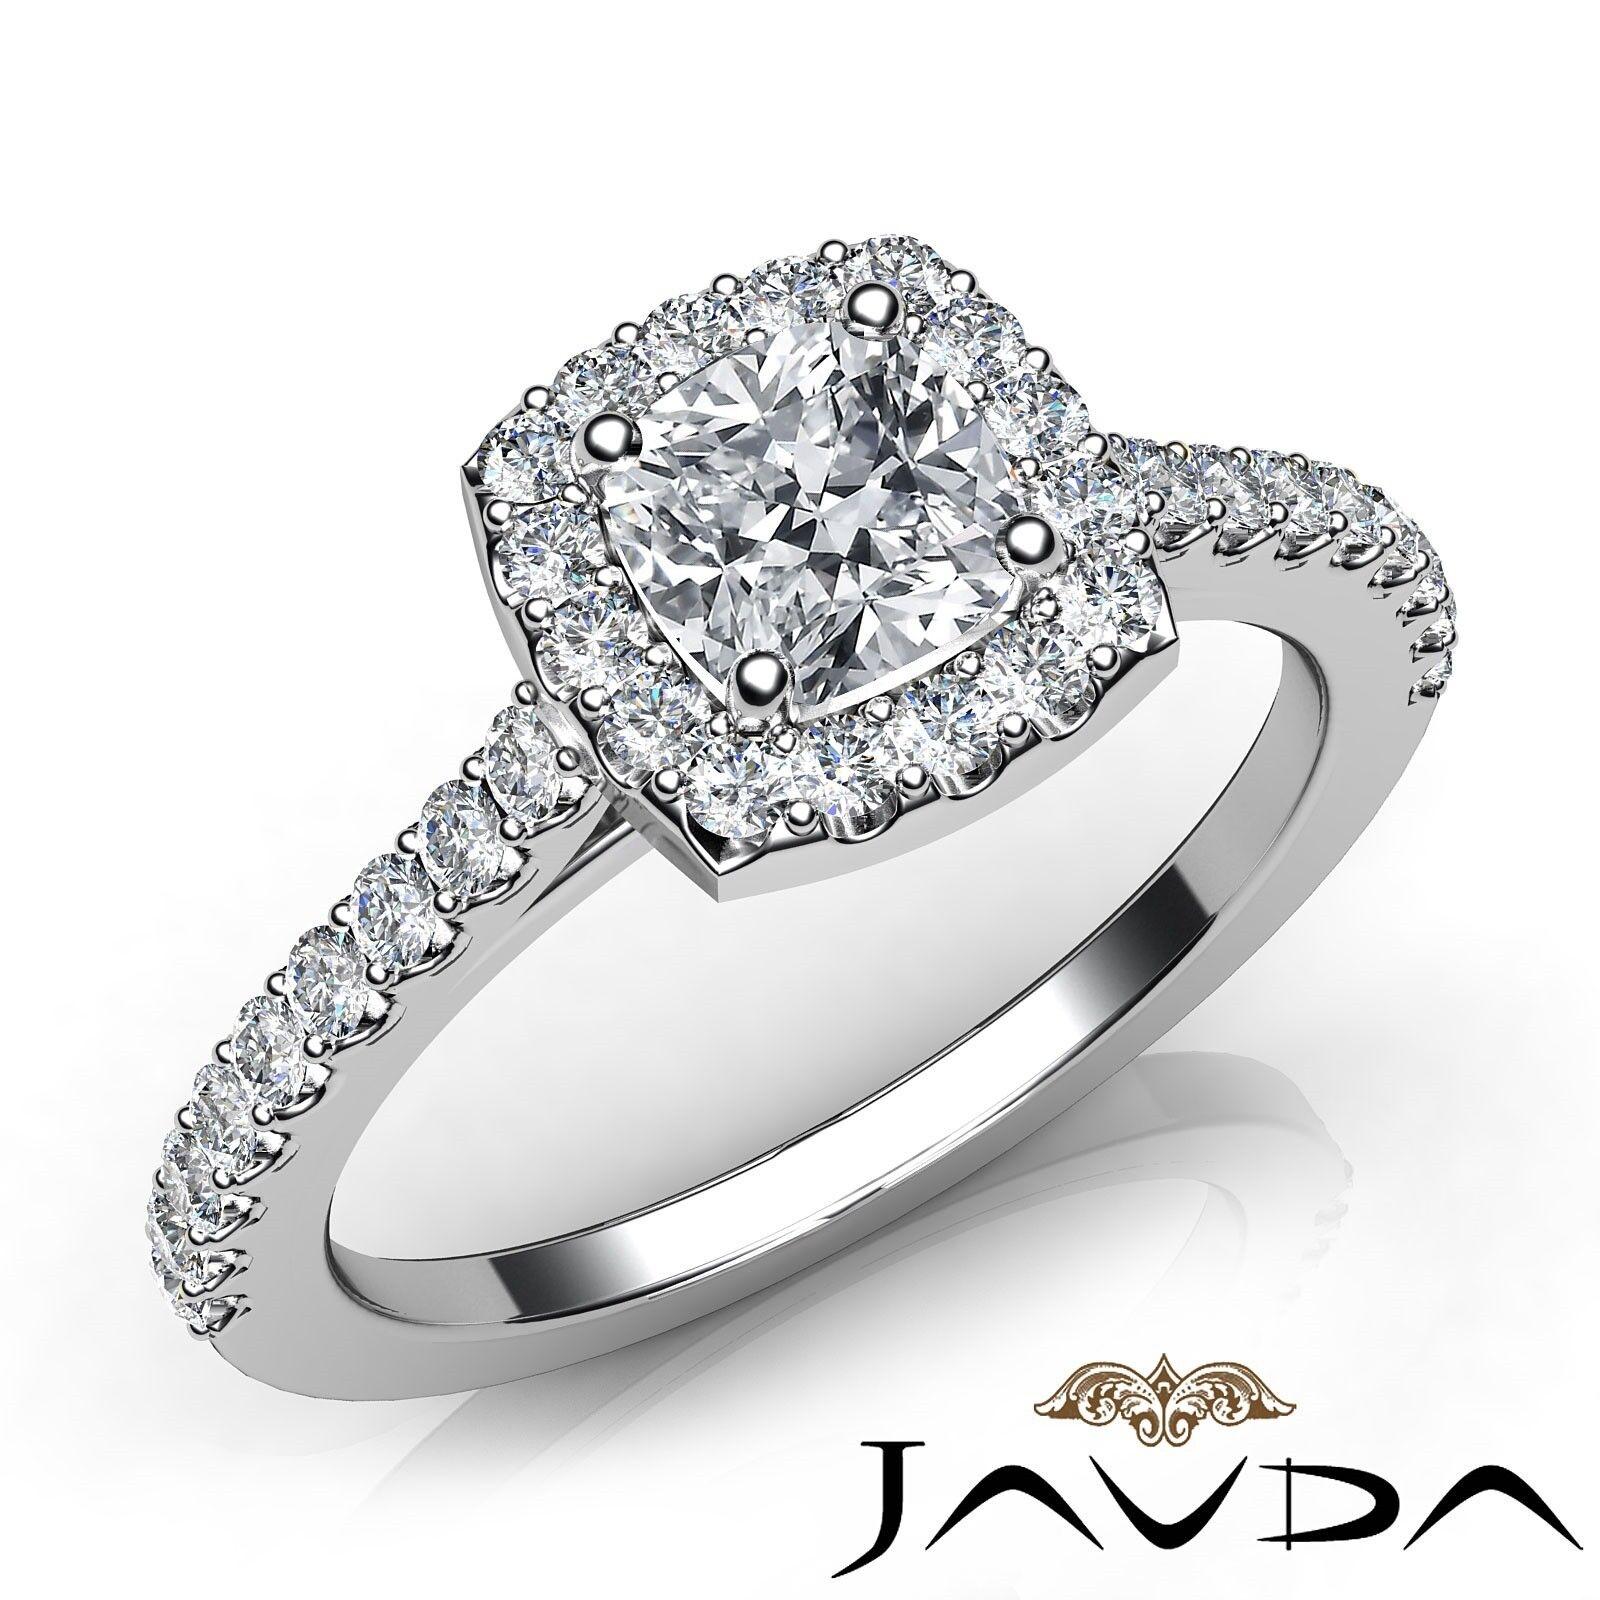 1ctw U Cut Pave Set Halo Cushion Diamond Engagement Ring GIA E-VS2 White Gold